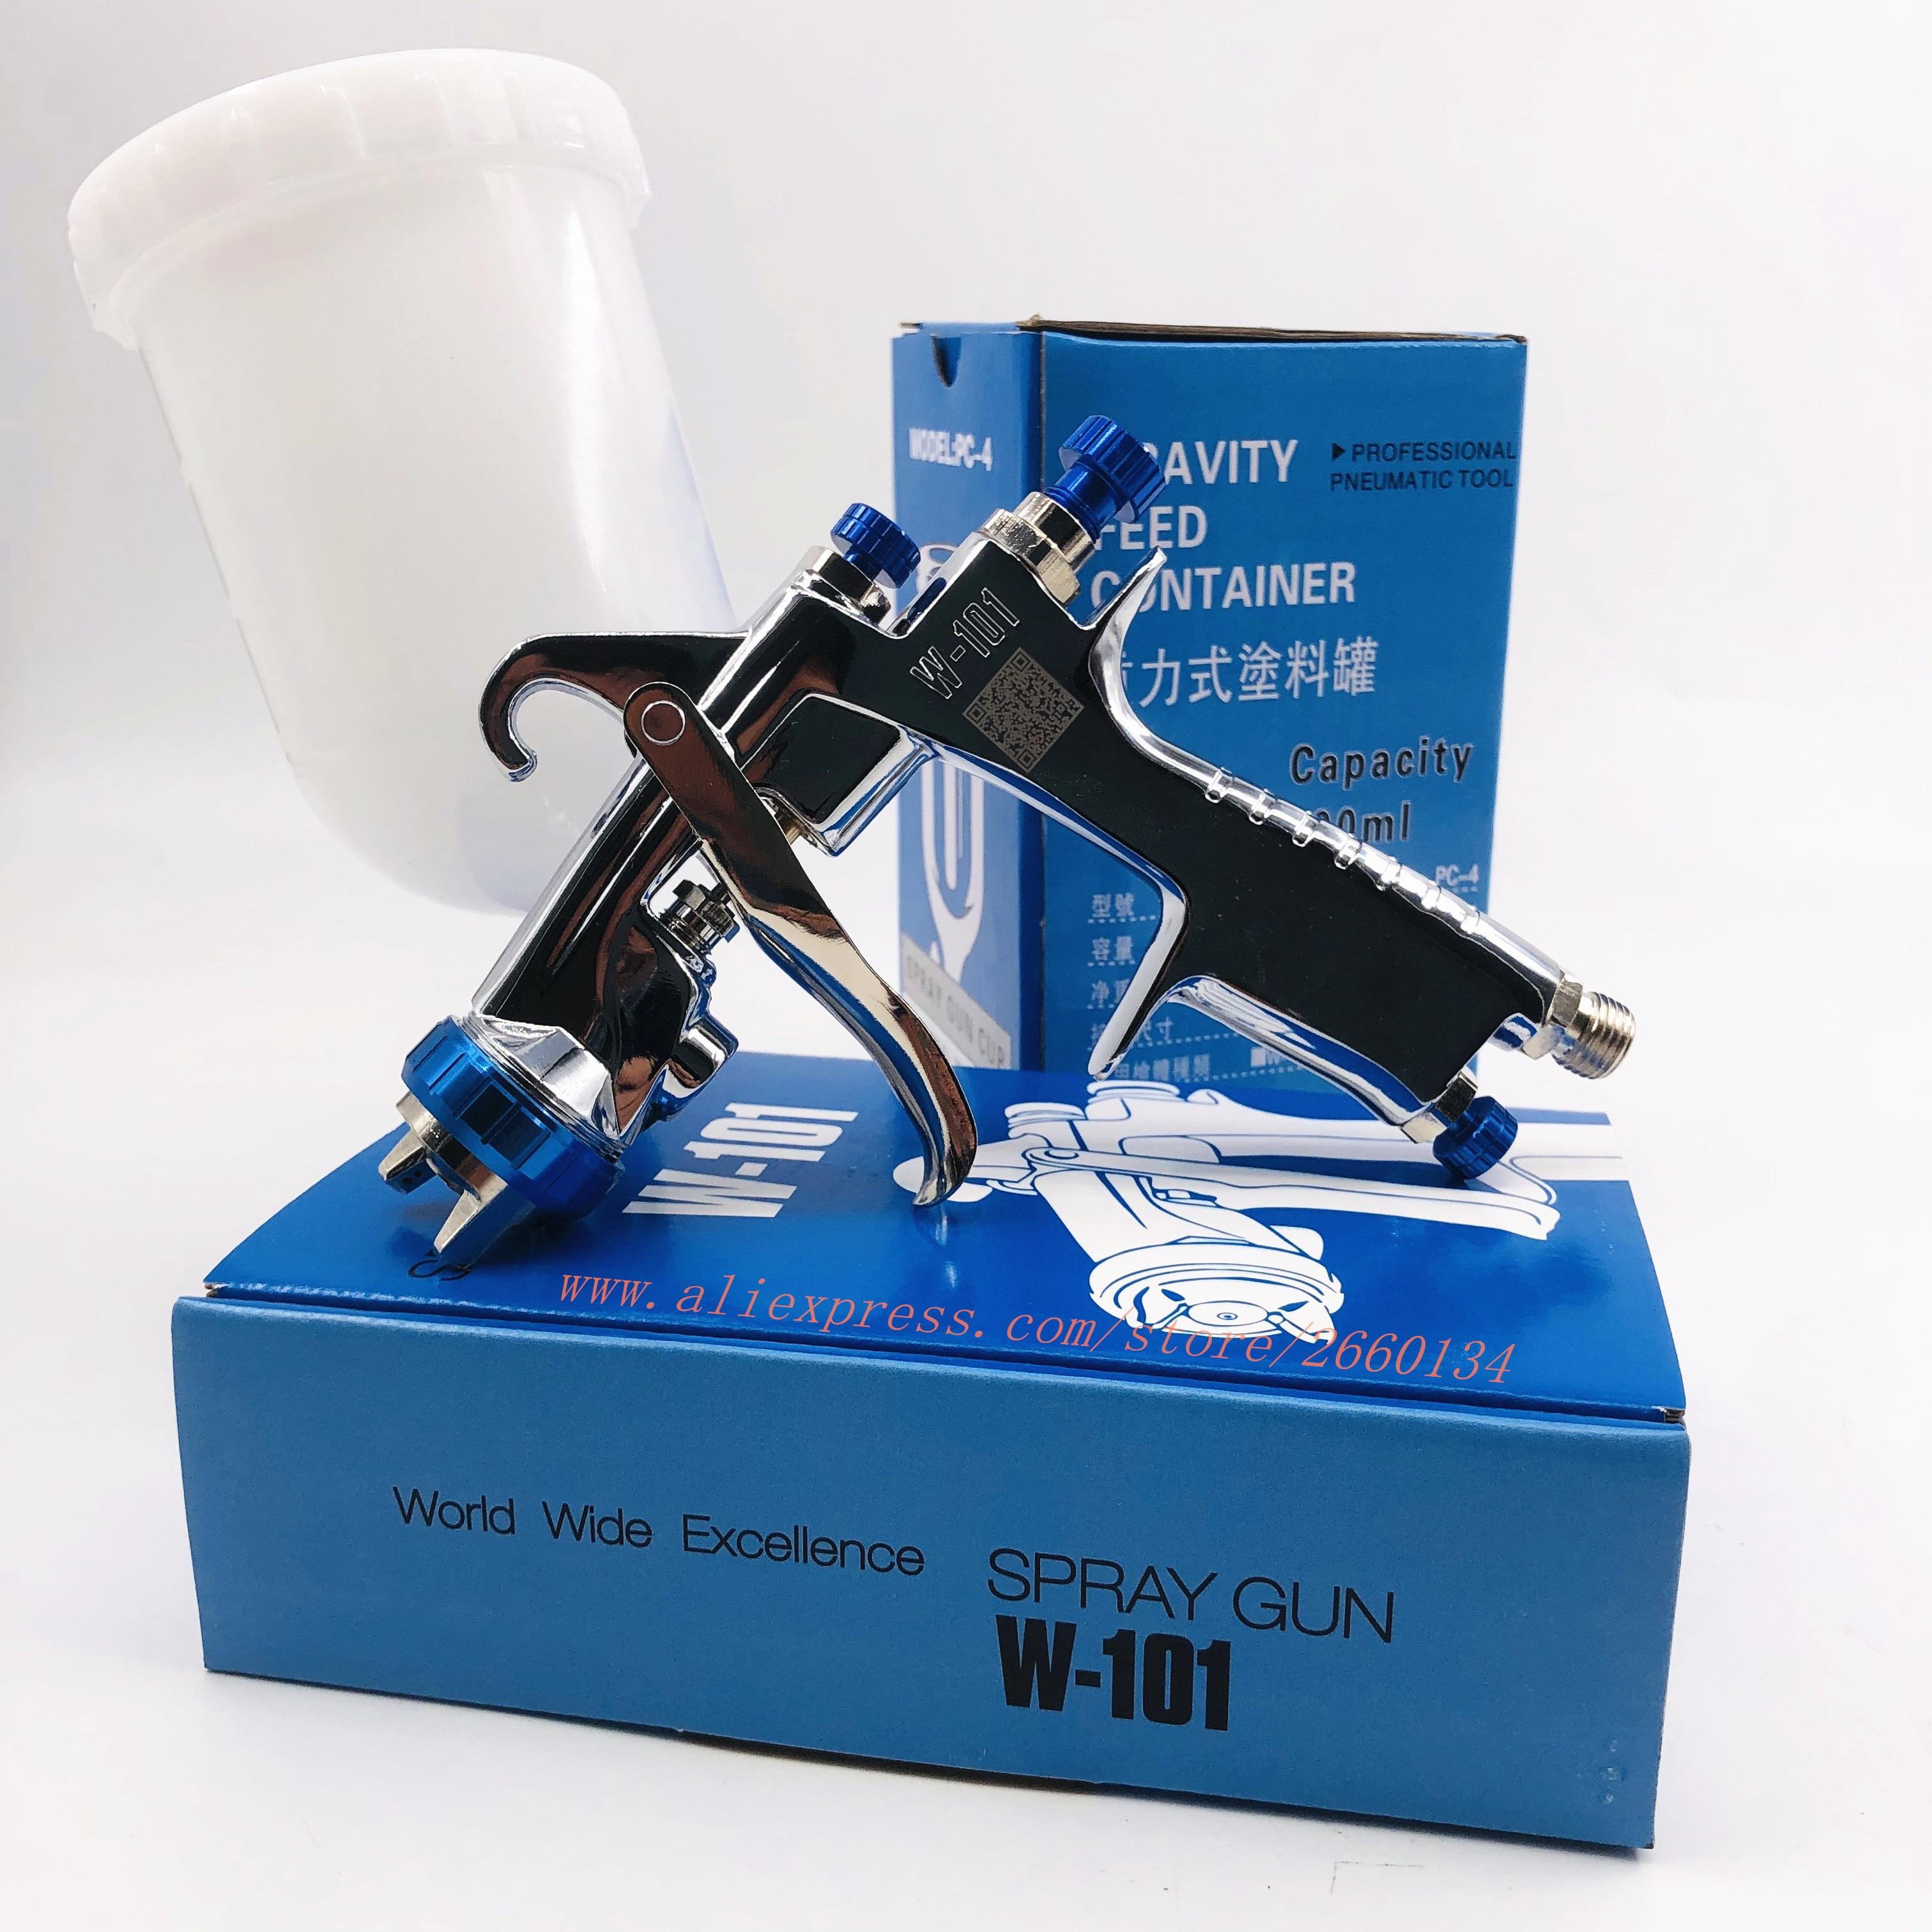 paint gun W101 air spray gun hand manual spray gun,1.0/1.3/1.5/1.8mm Japan quality, W 101 paint Sprayer 400CC plastic tank-in Spray Guns from Tools on